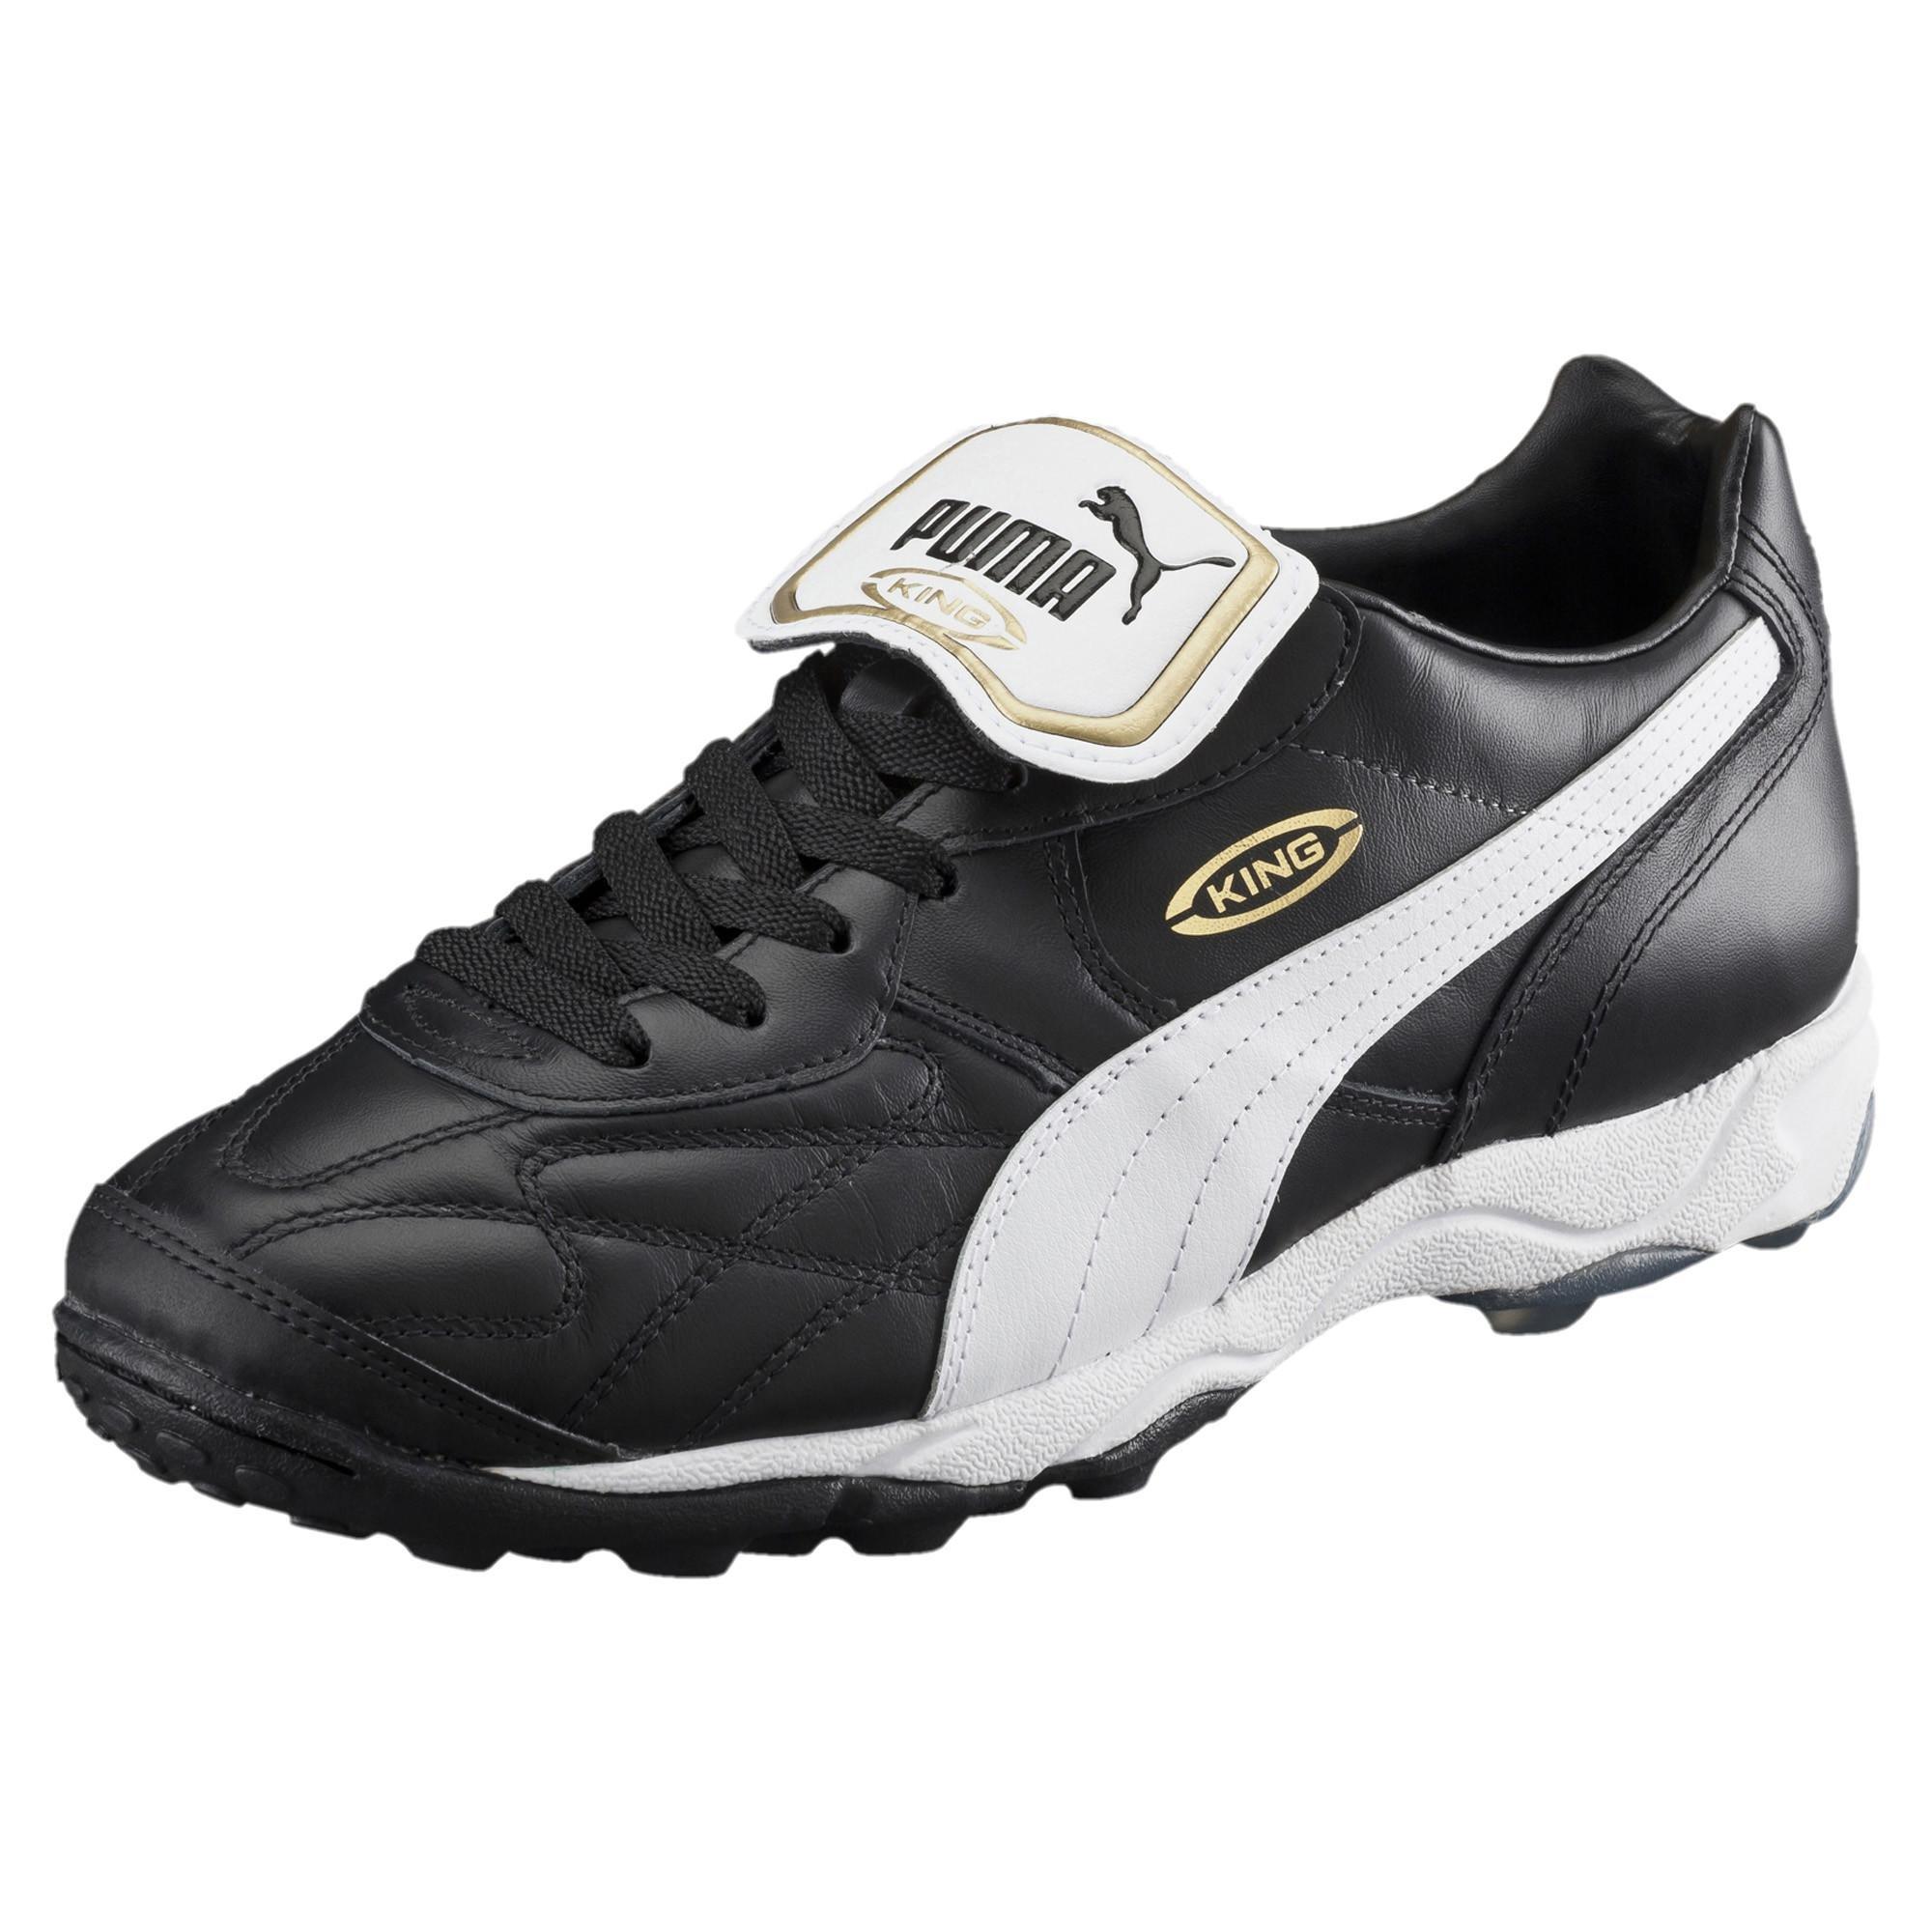 798b976f5e6c Lyst - PUMA Soccer Shoe King Allround Tt in Black for Men - Save 43%